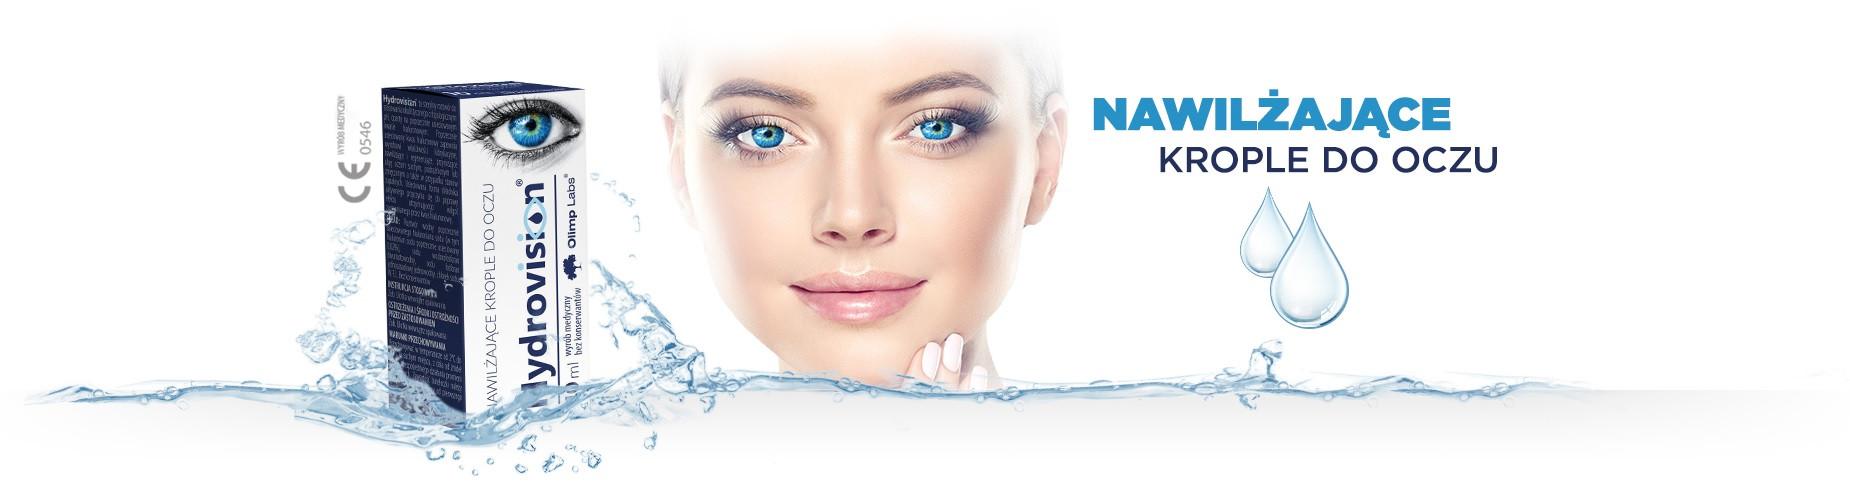 hydrovision reklama